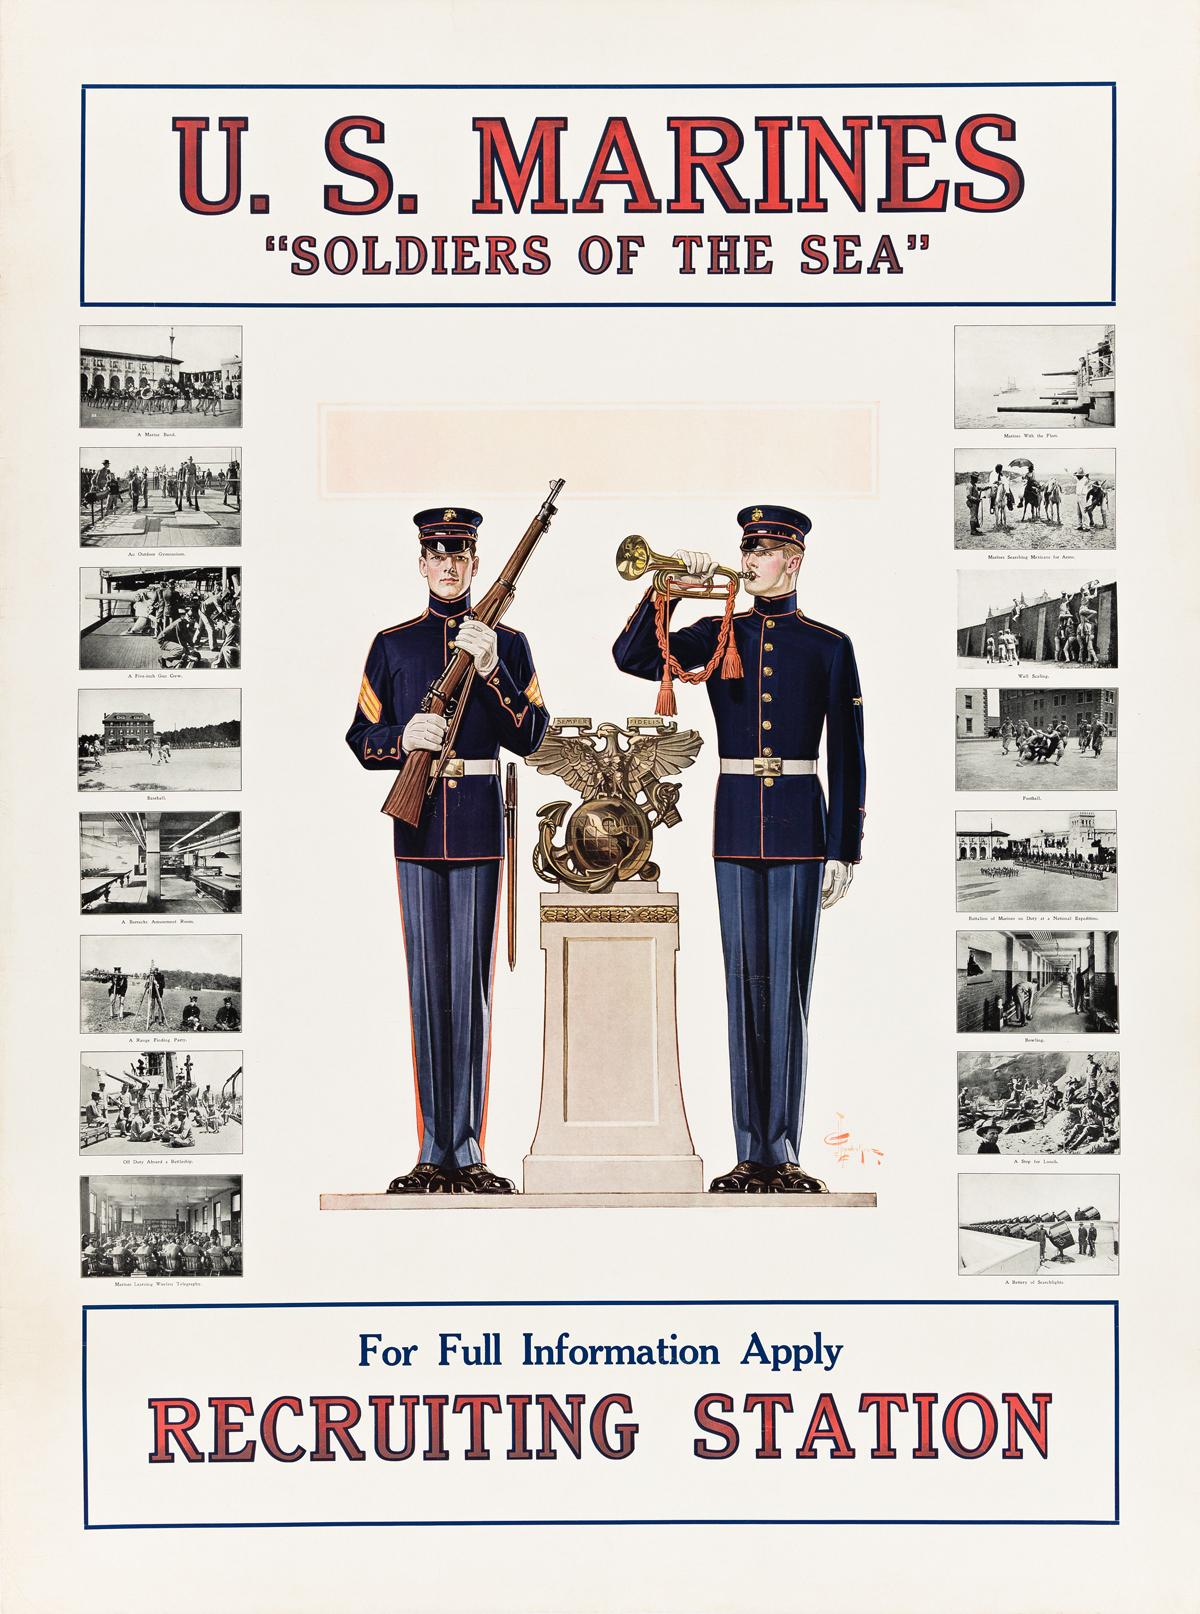 JOSEPH C. LEYENDECKER (1874-1951).  U.S. MARINES / SOLDIERS OF THE SEA. Circa 1917. 40¼x30 inches, 102¼x76¼ cm.